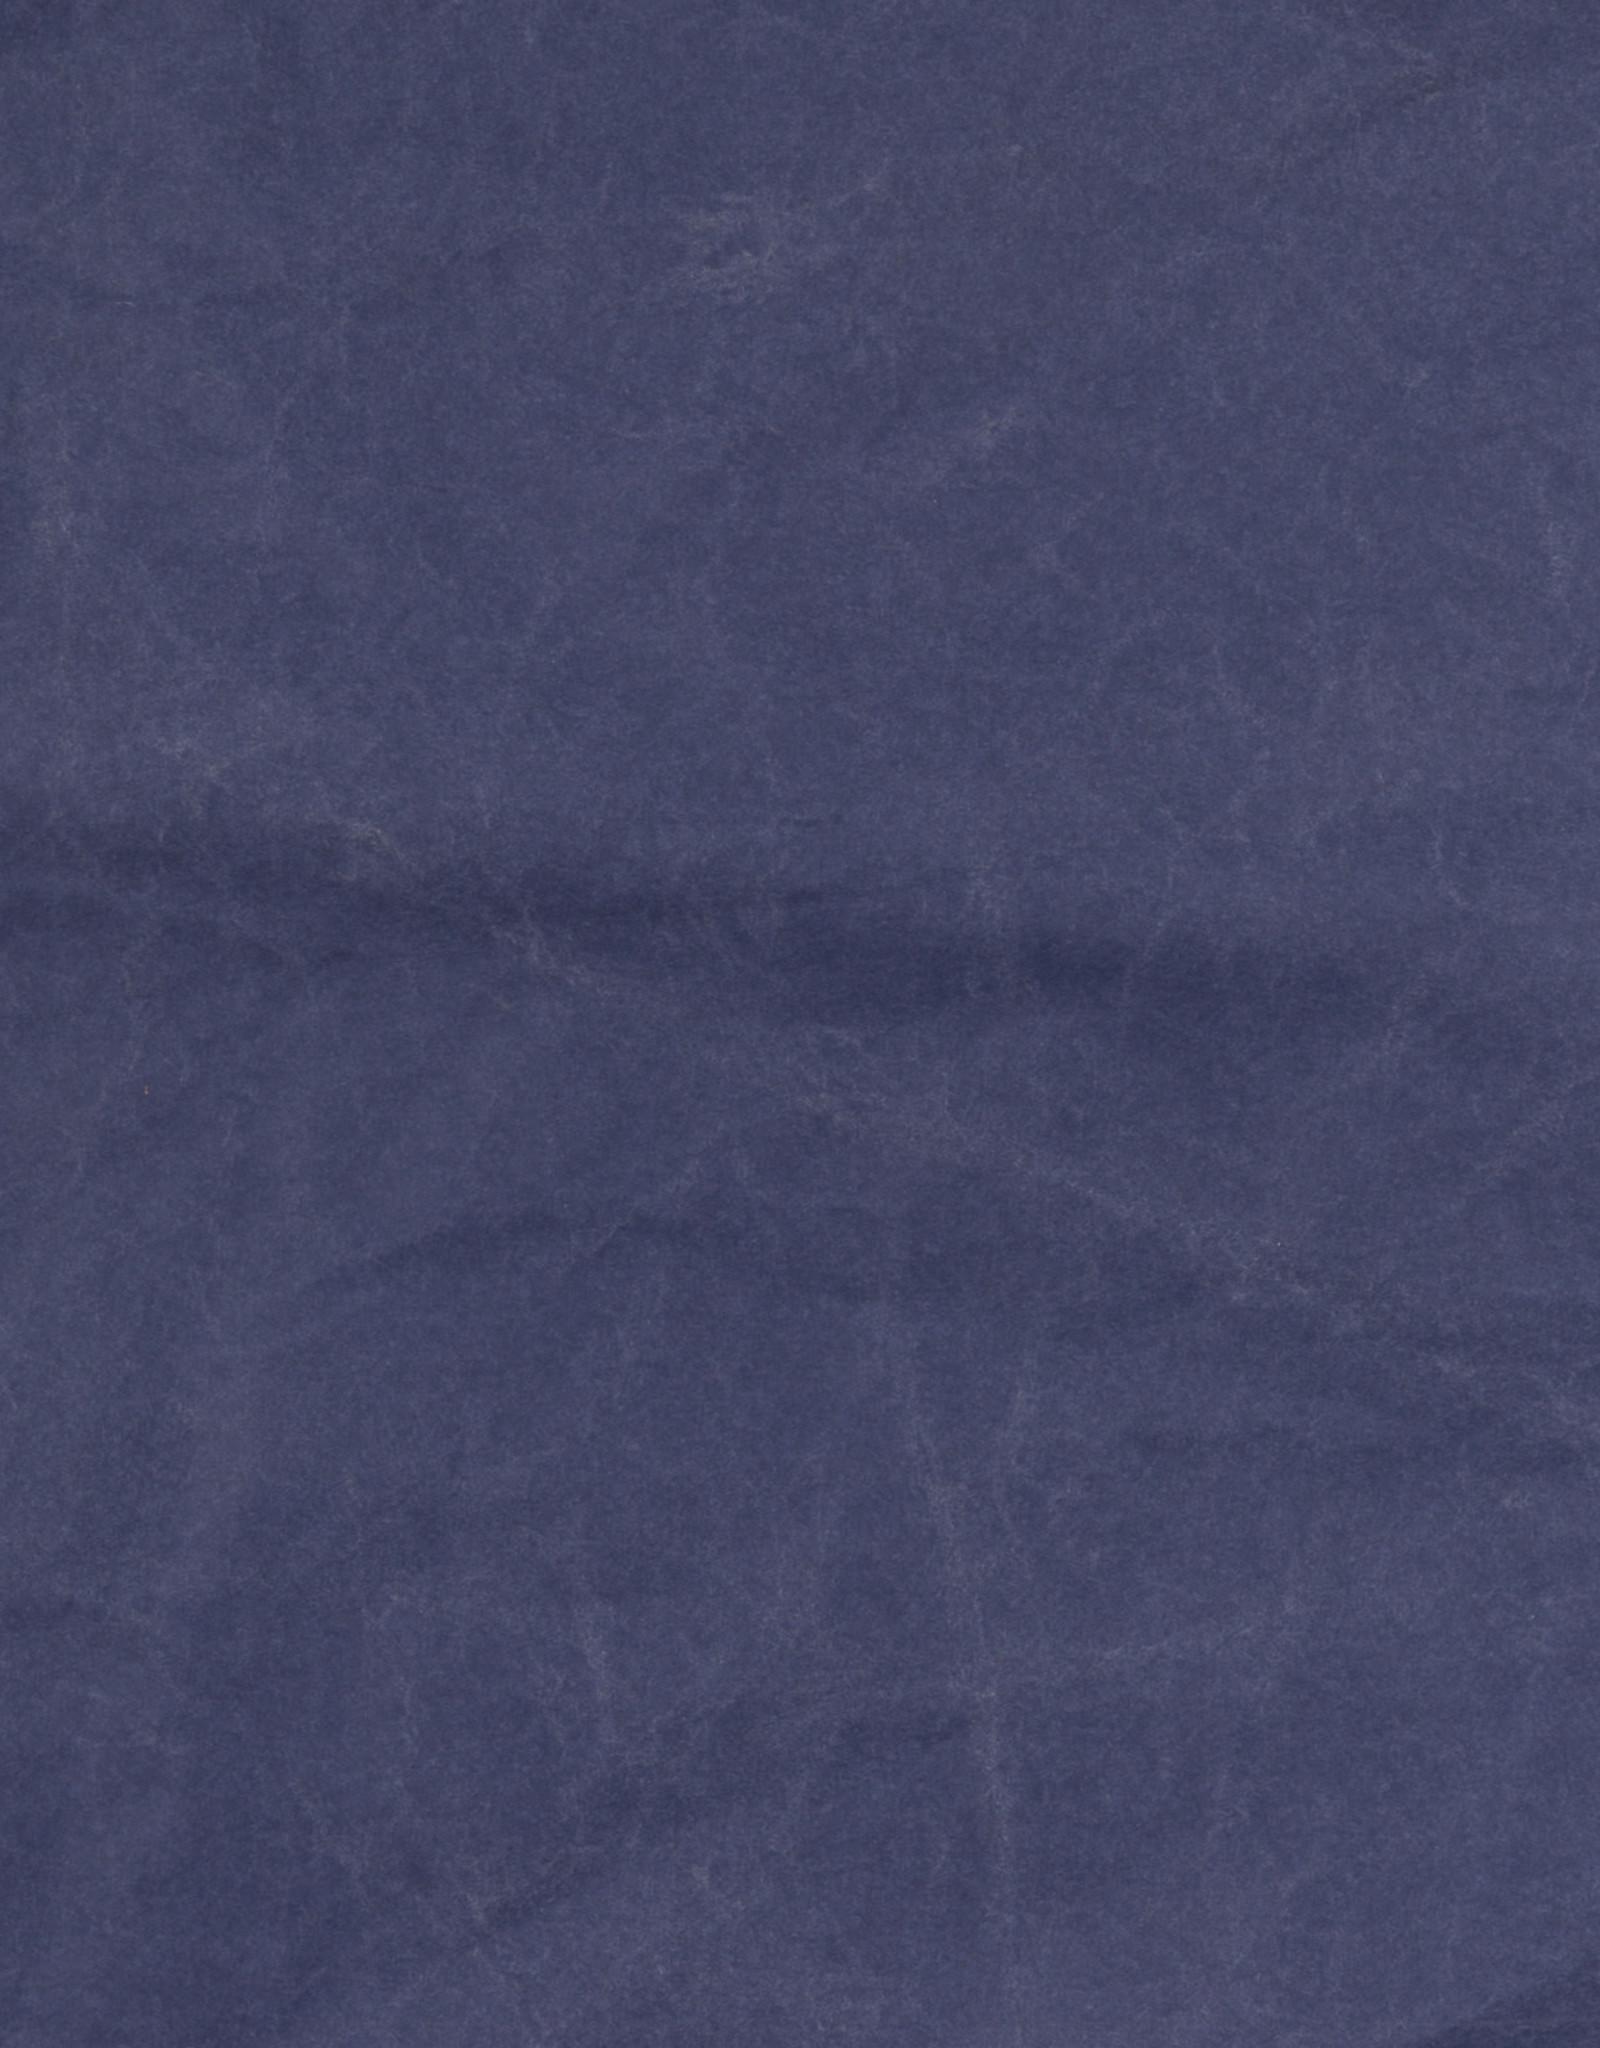 Snappap - Blauw 100cm x 63cm